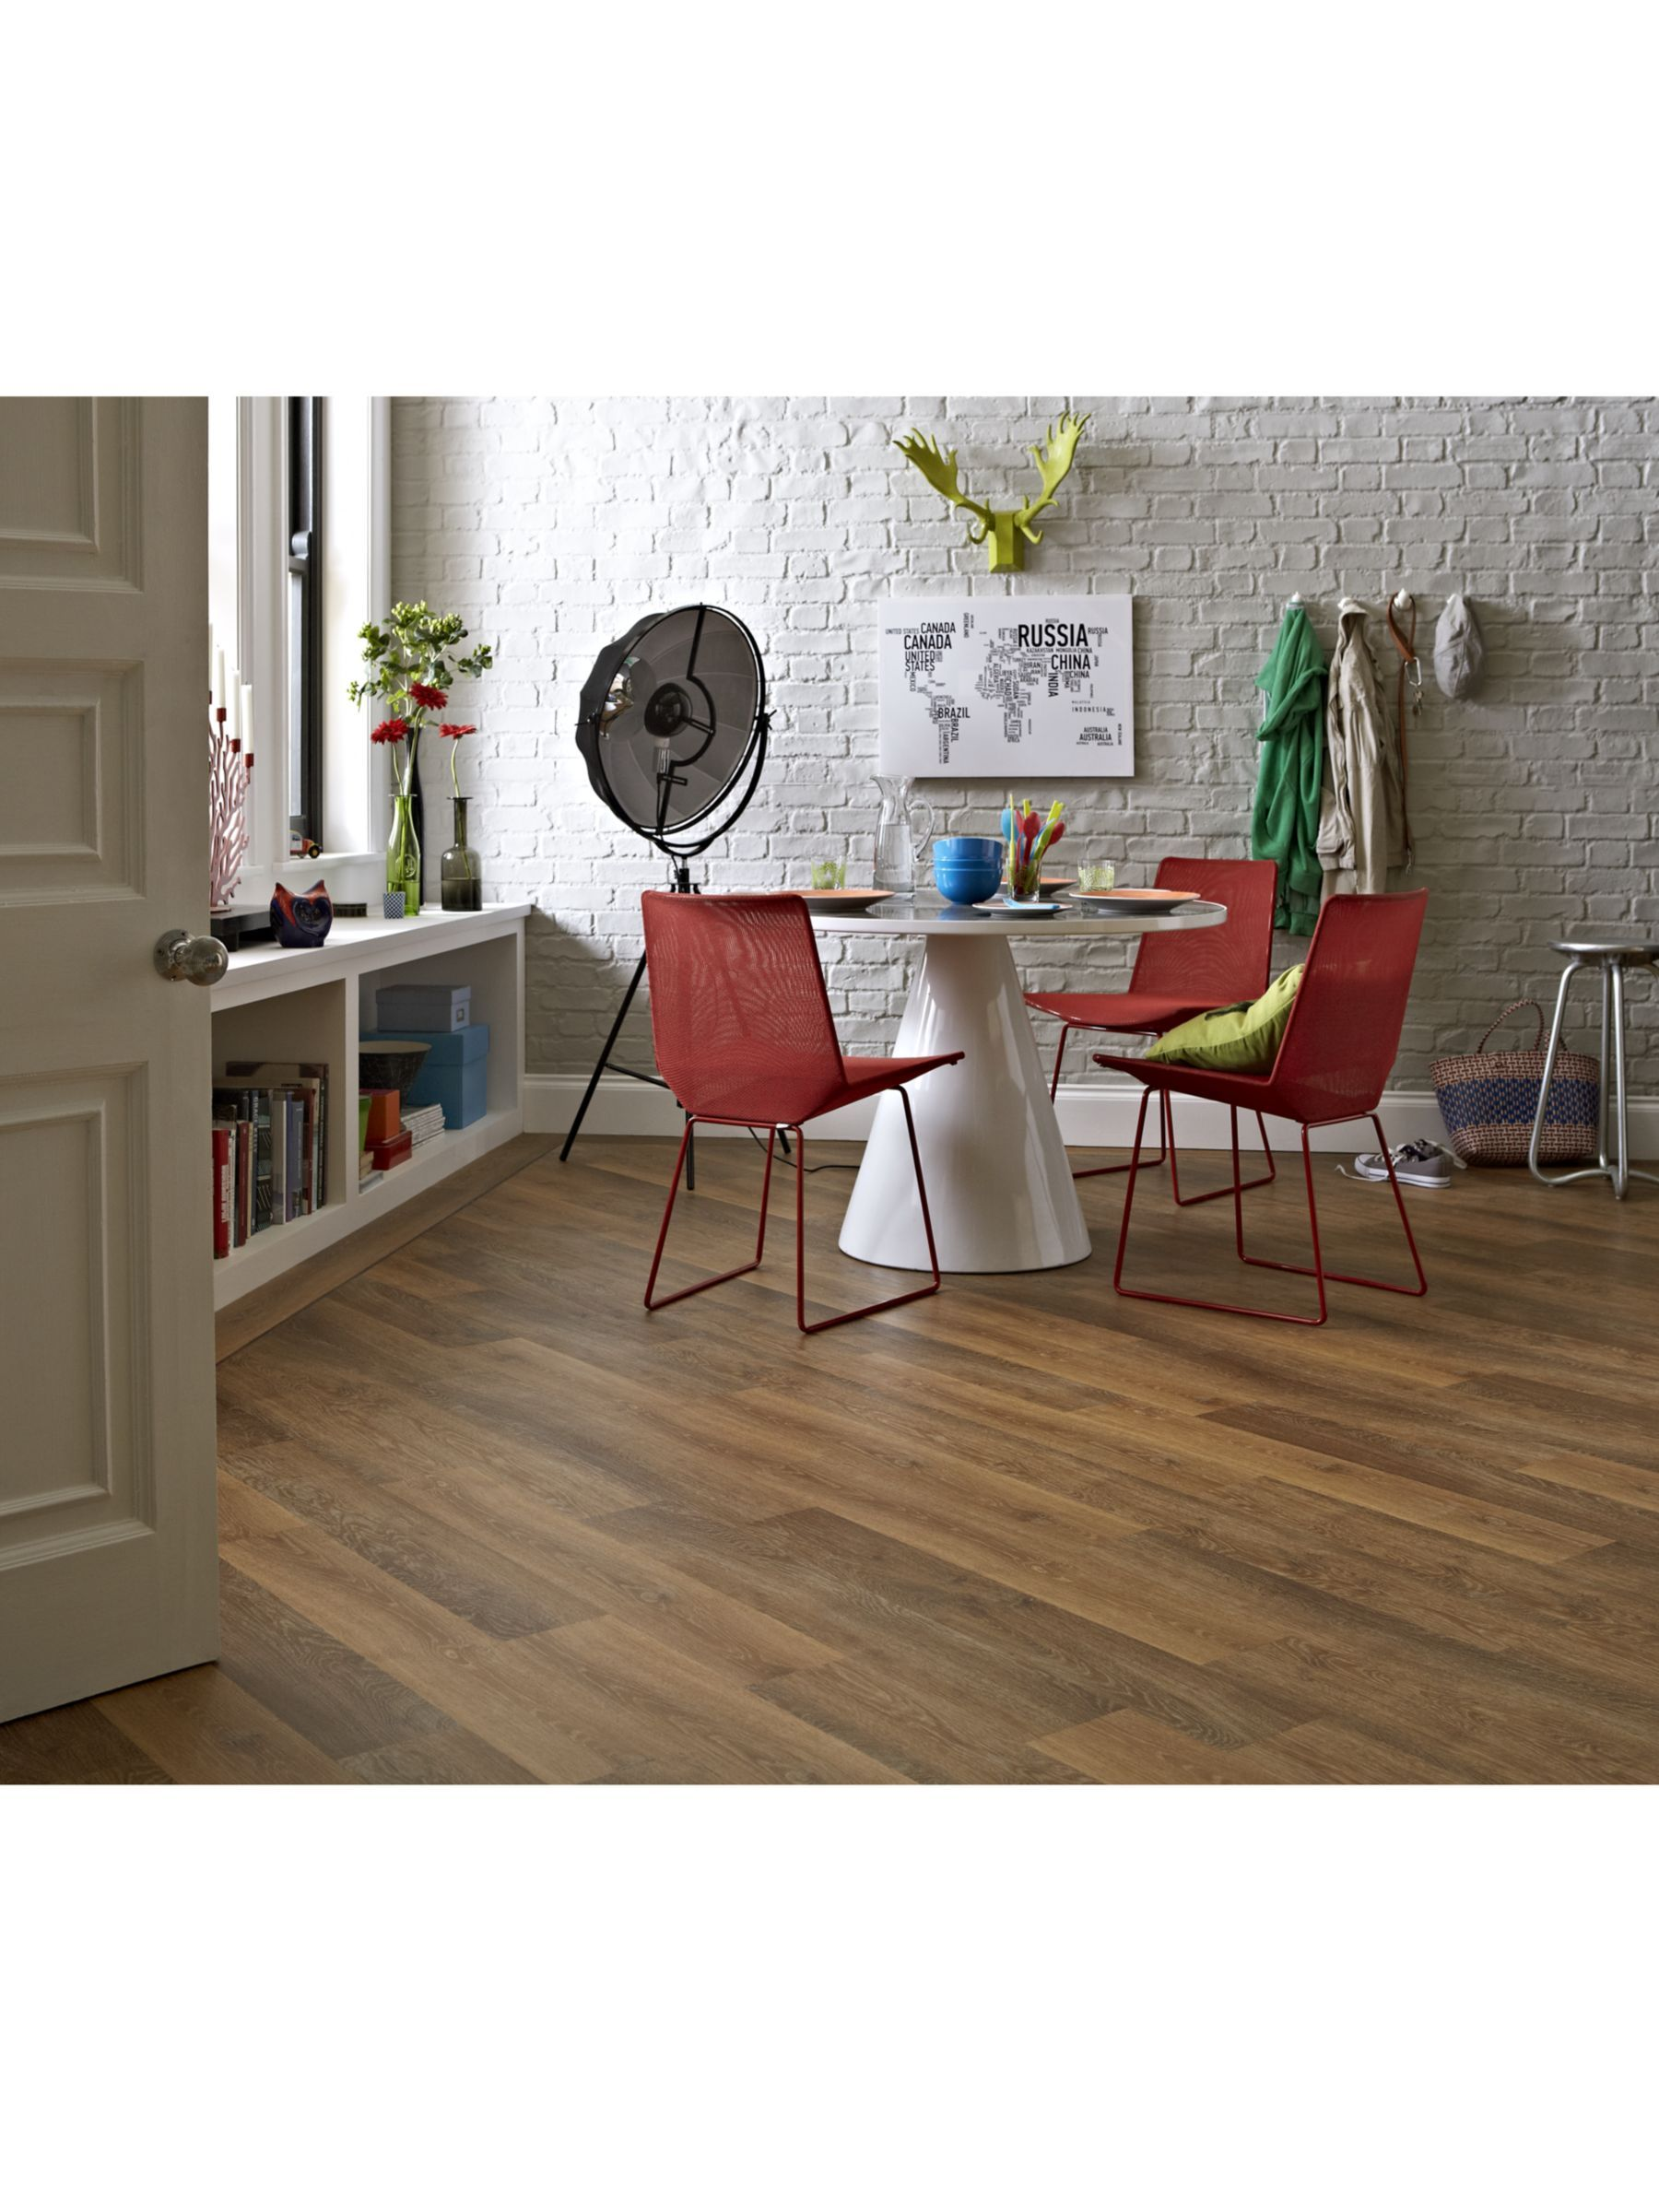 Karndean Knight Tile Wood Vinyl Flooring, Classic Limed